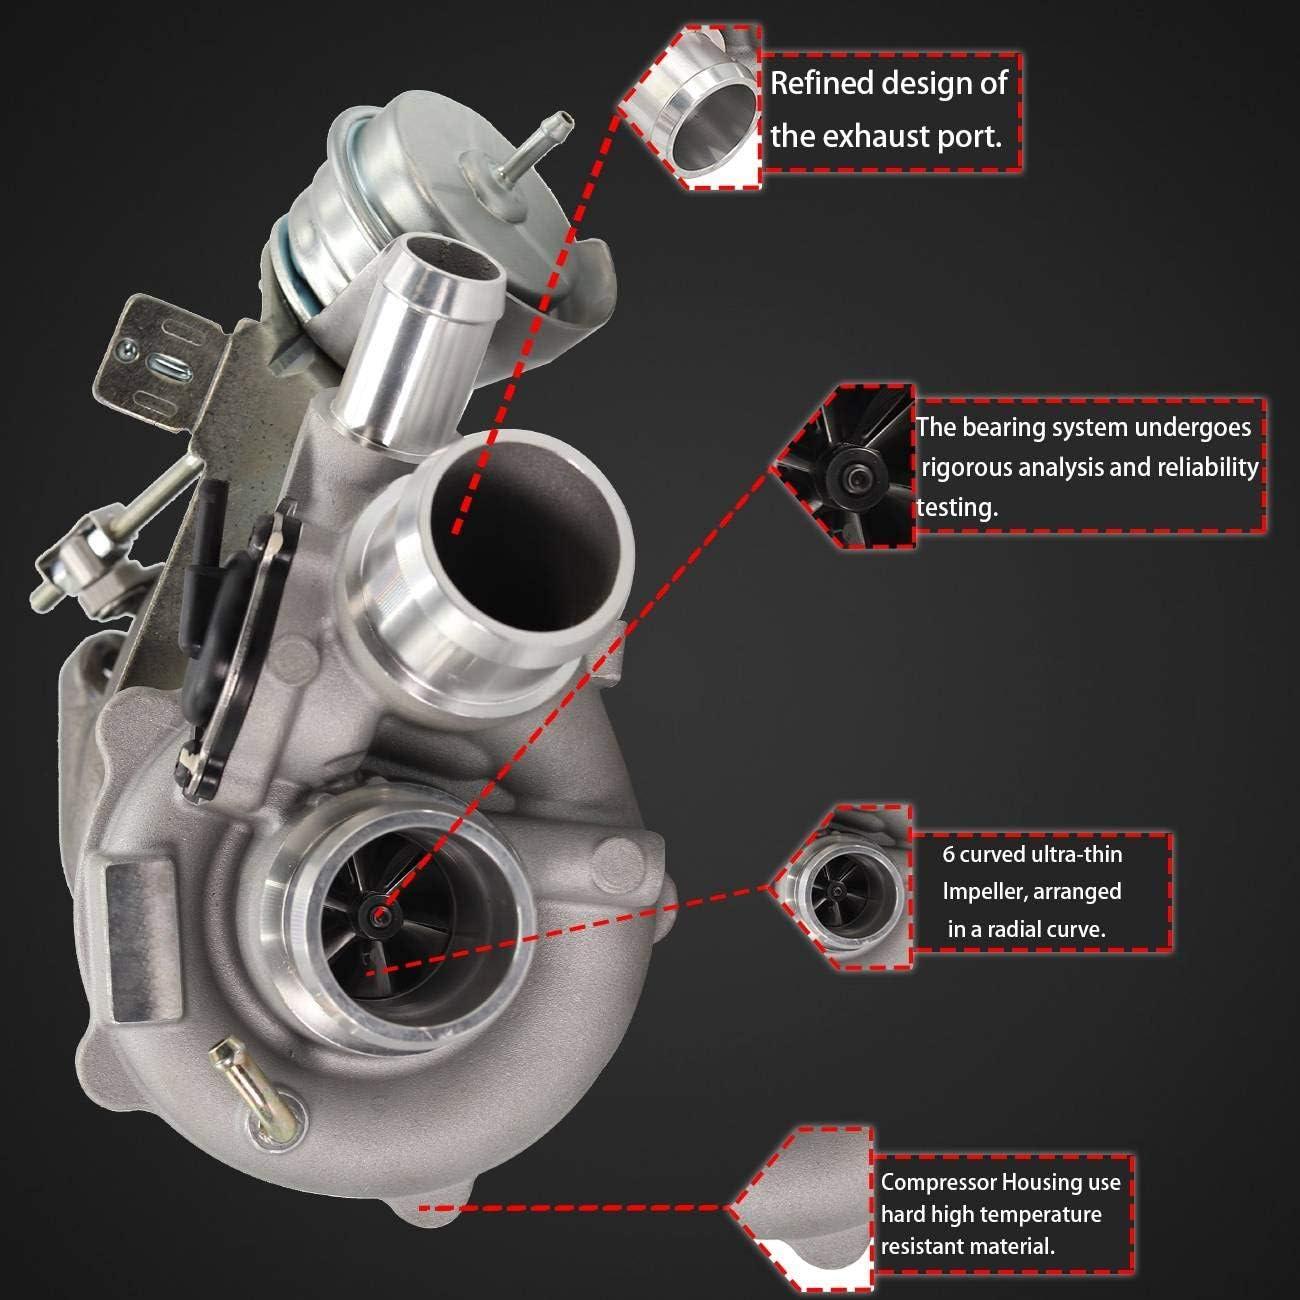 Bapmic CL3Z-6K682-C Left Turbo Turbocharger for Ford F-150 Ecoboost 2011 2012